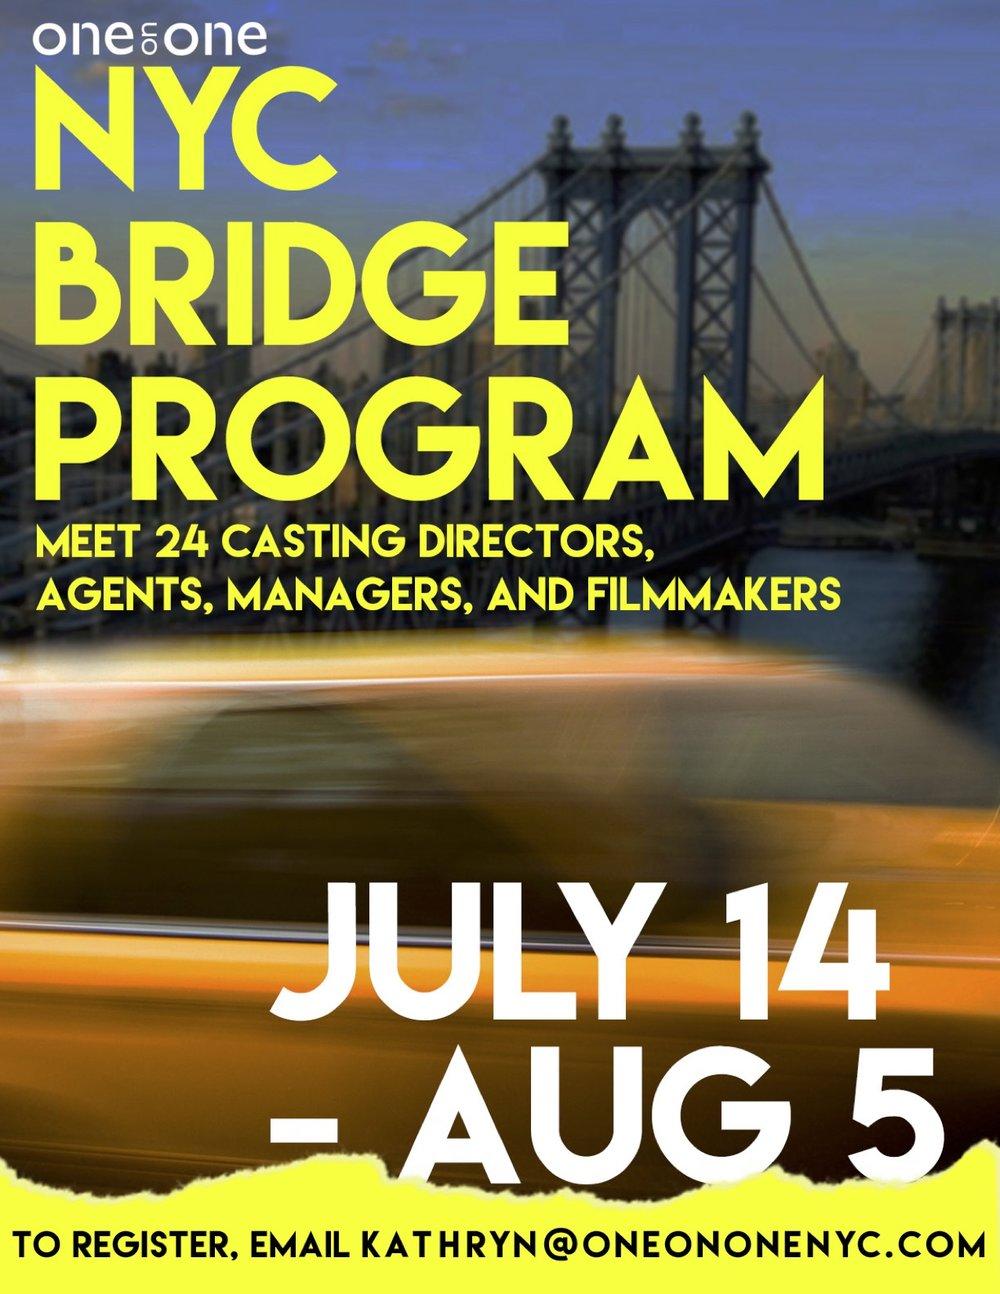 Bridge Program Brochure G1 (dragged) 1.jpg